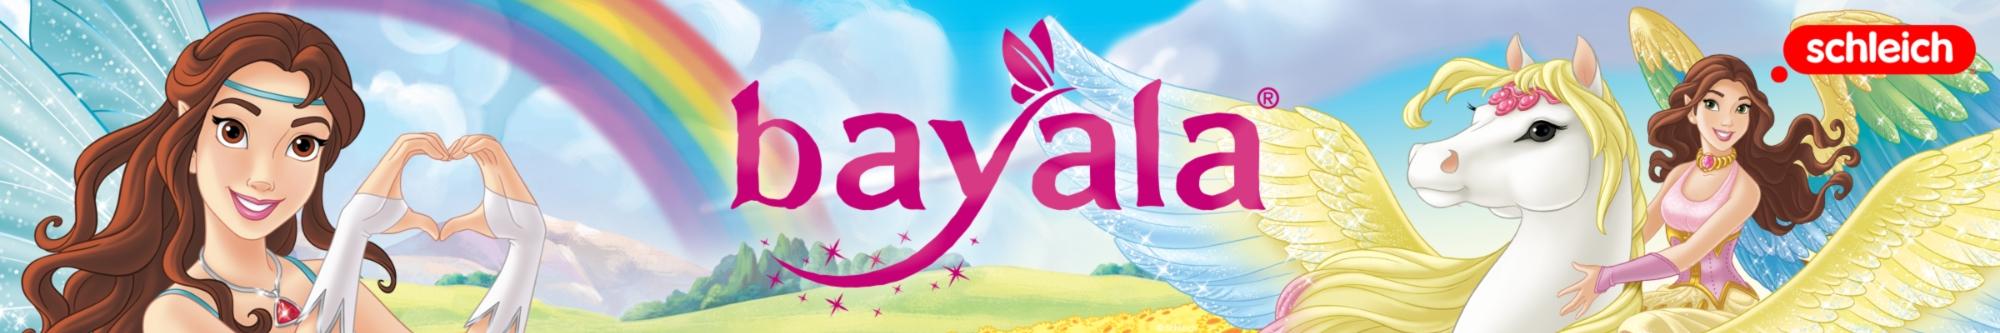 Showroom - bayala